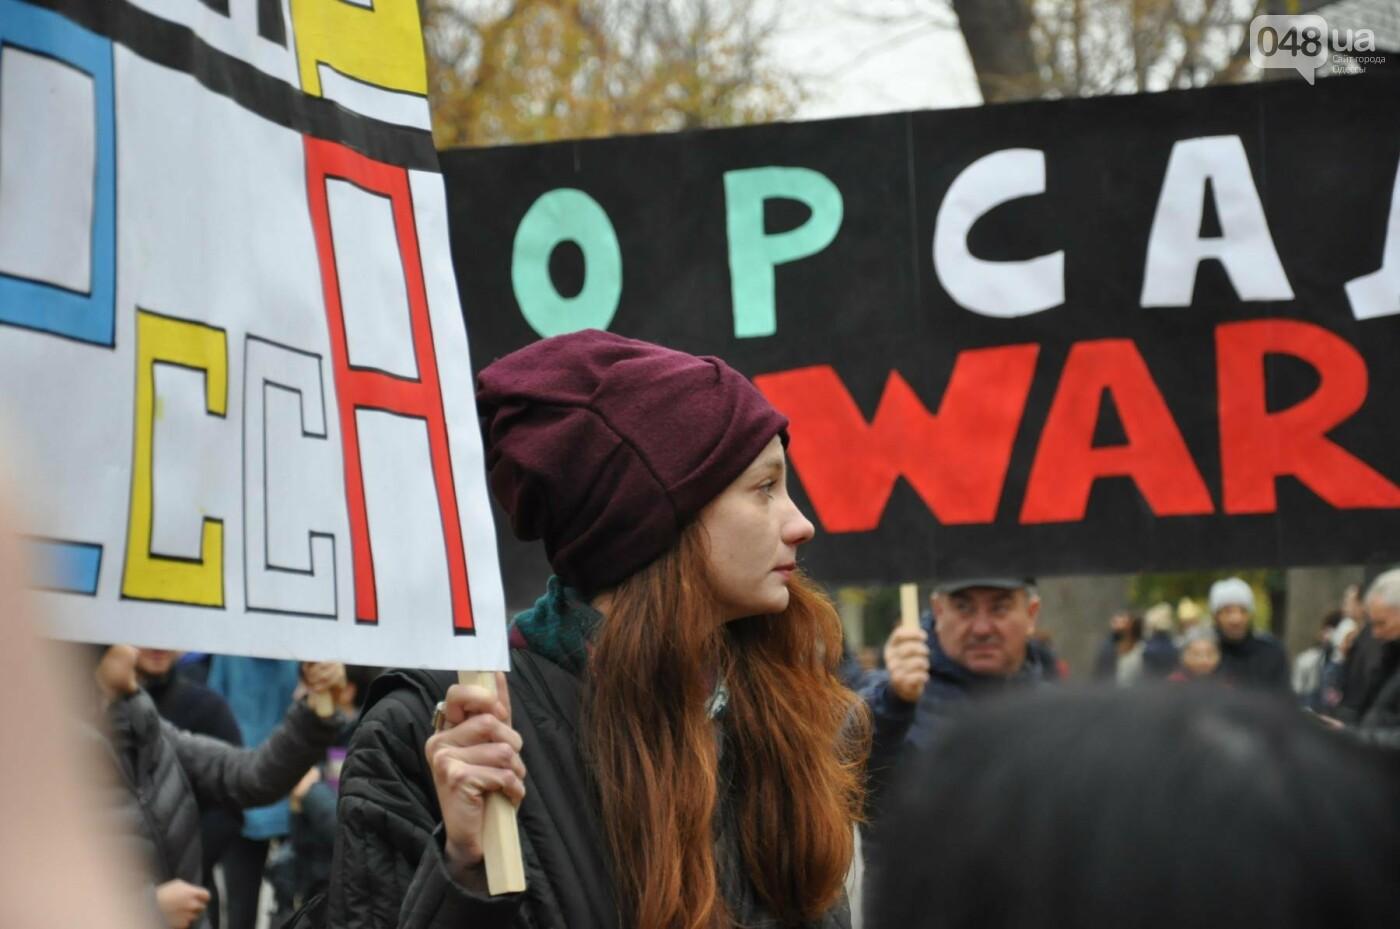 Около 5 сотен одесситов протестовали против застройки Горсада (ФОТО) , фото-1